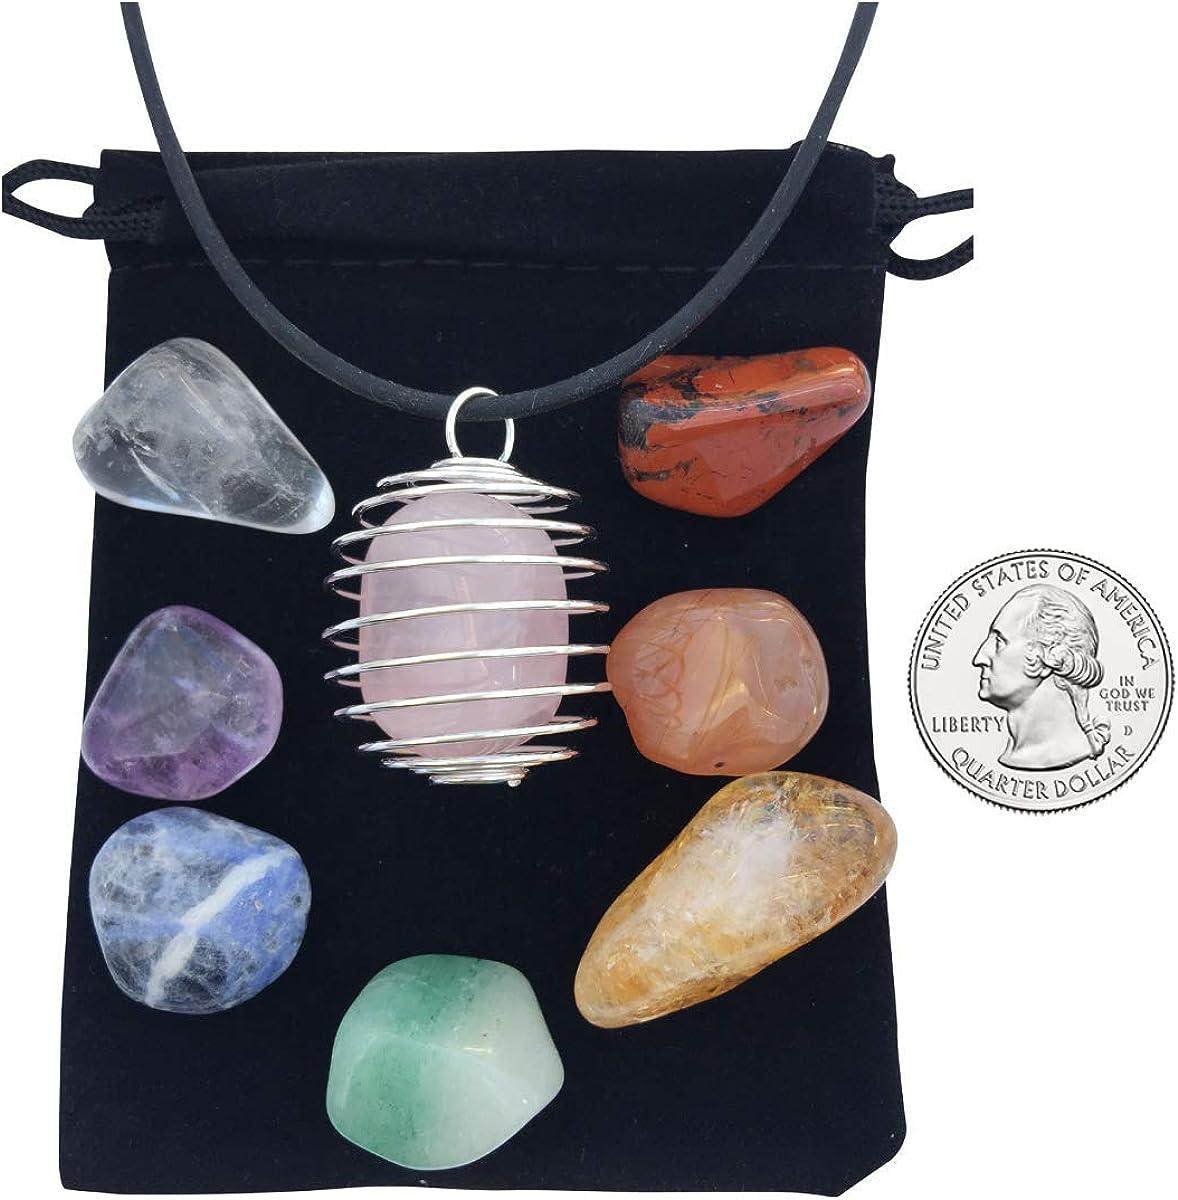 Chakra Crystal Set 7 Chakra Stones Healing Stones Healing Crystals Gemstone Balls 12pcs 12mm Spheres Undrilled Genuine Gemstones